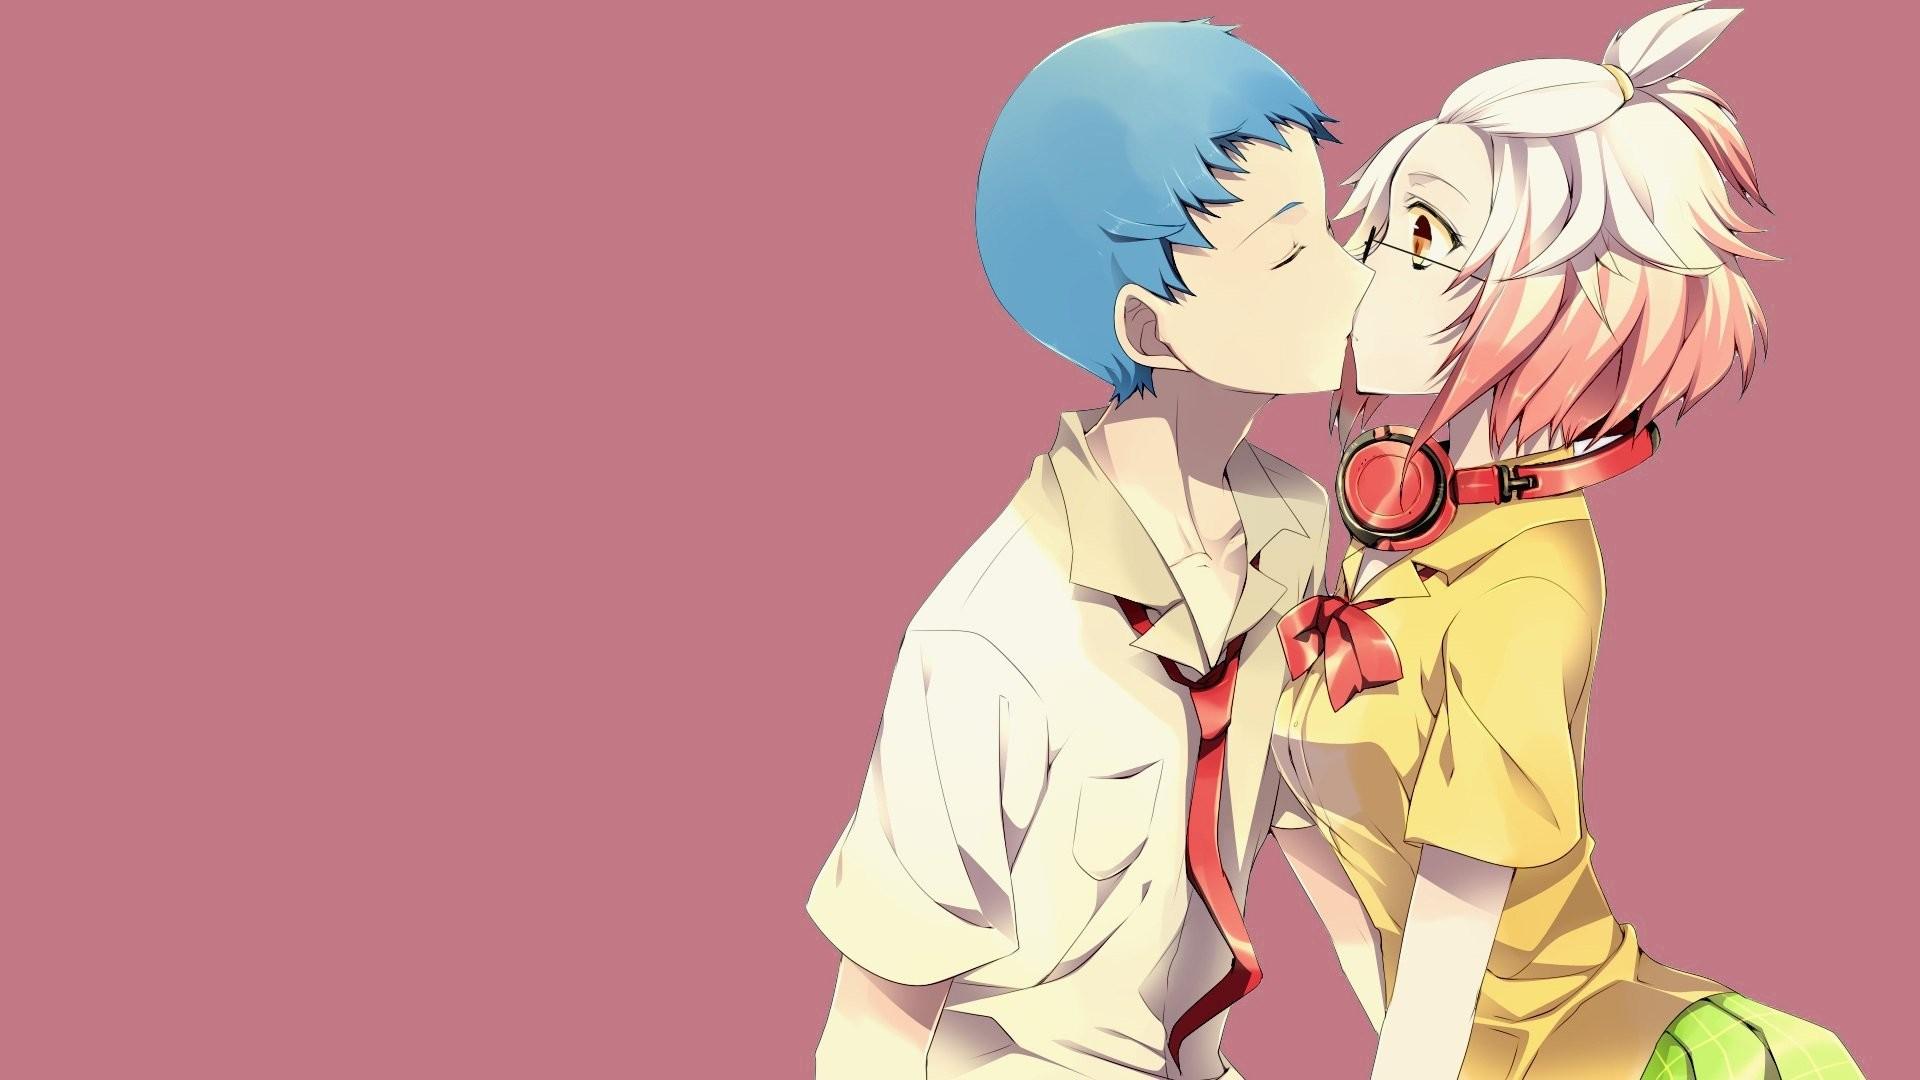 Res: 1920x1080, Anime Couple Kiss Wallpaper